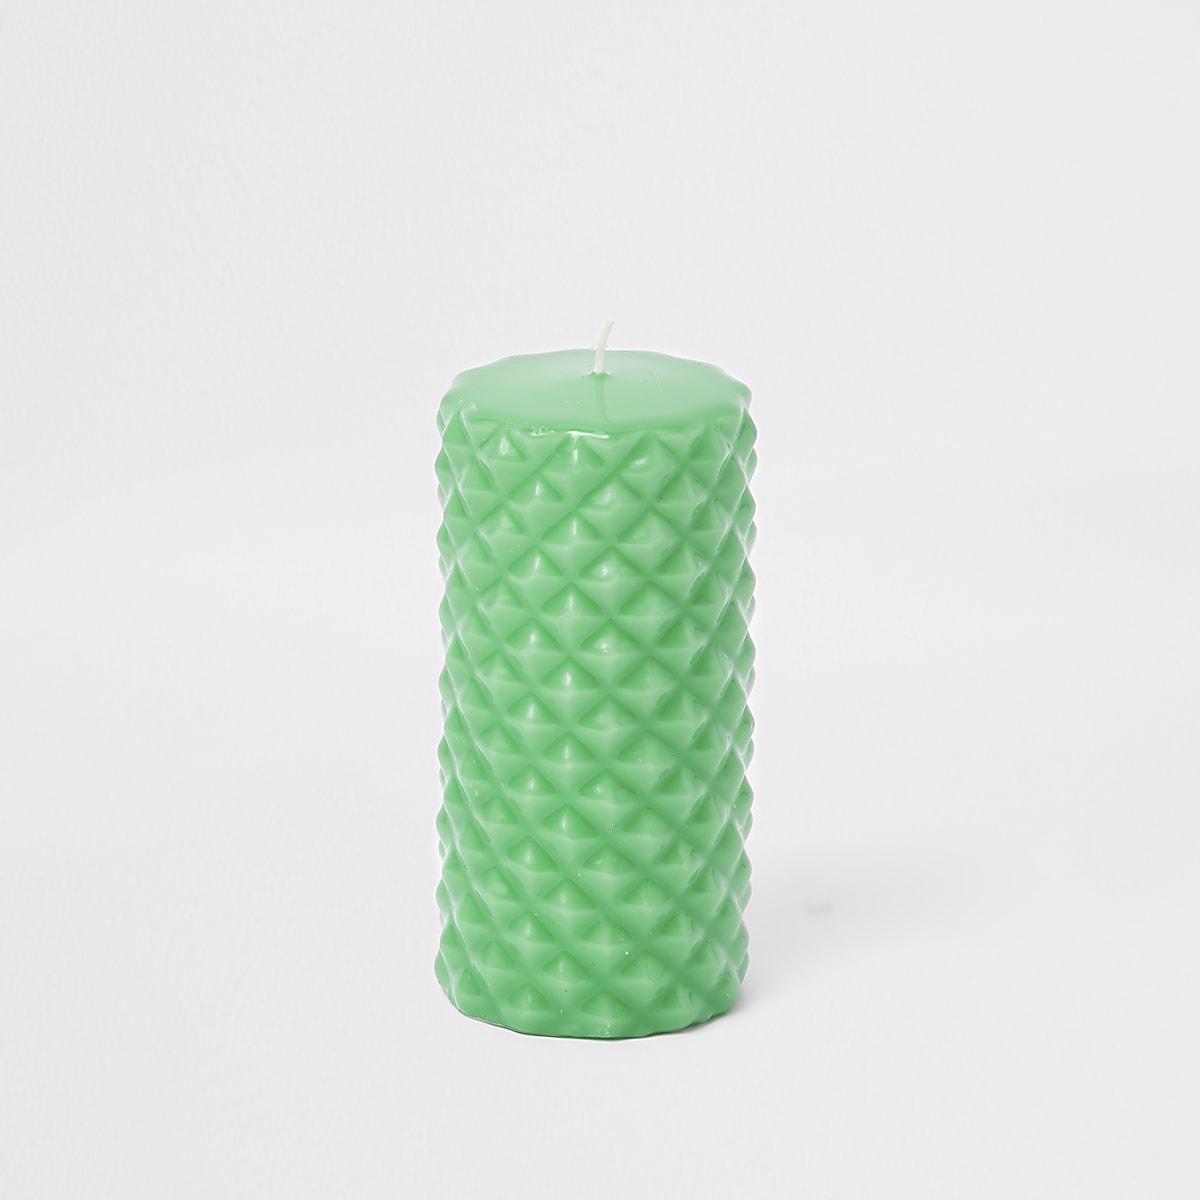 Green spike pillar candle